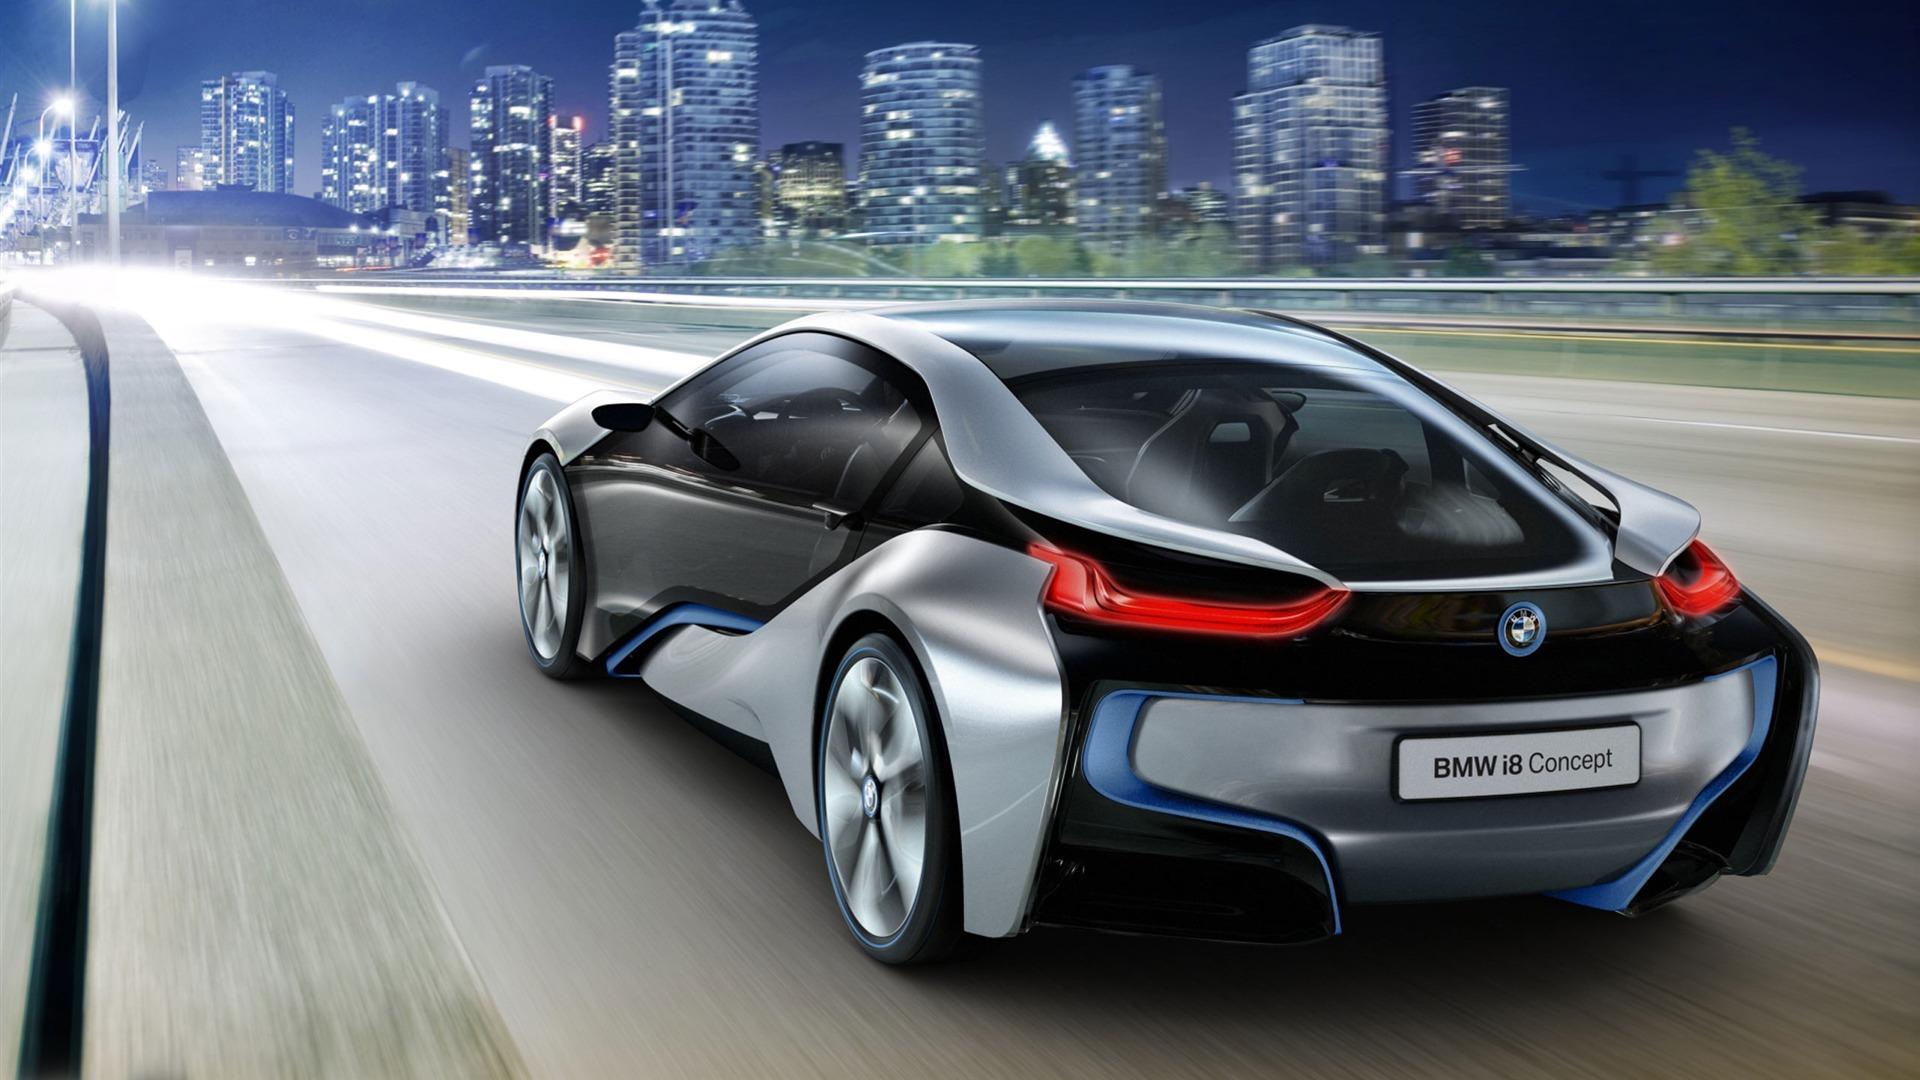 Used Bmw Z4 >> BMW i8 brand concept car HD wallpaper 02 Preview | 10wallpaper.com